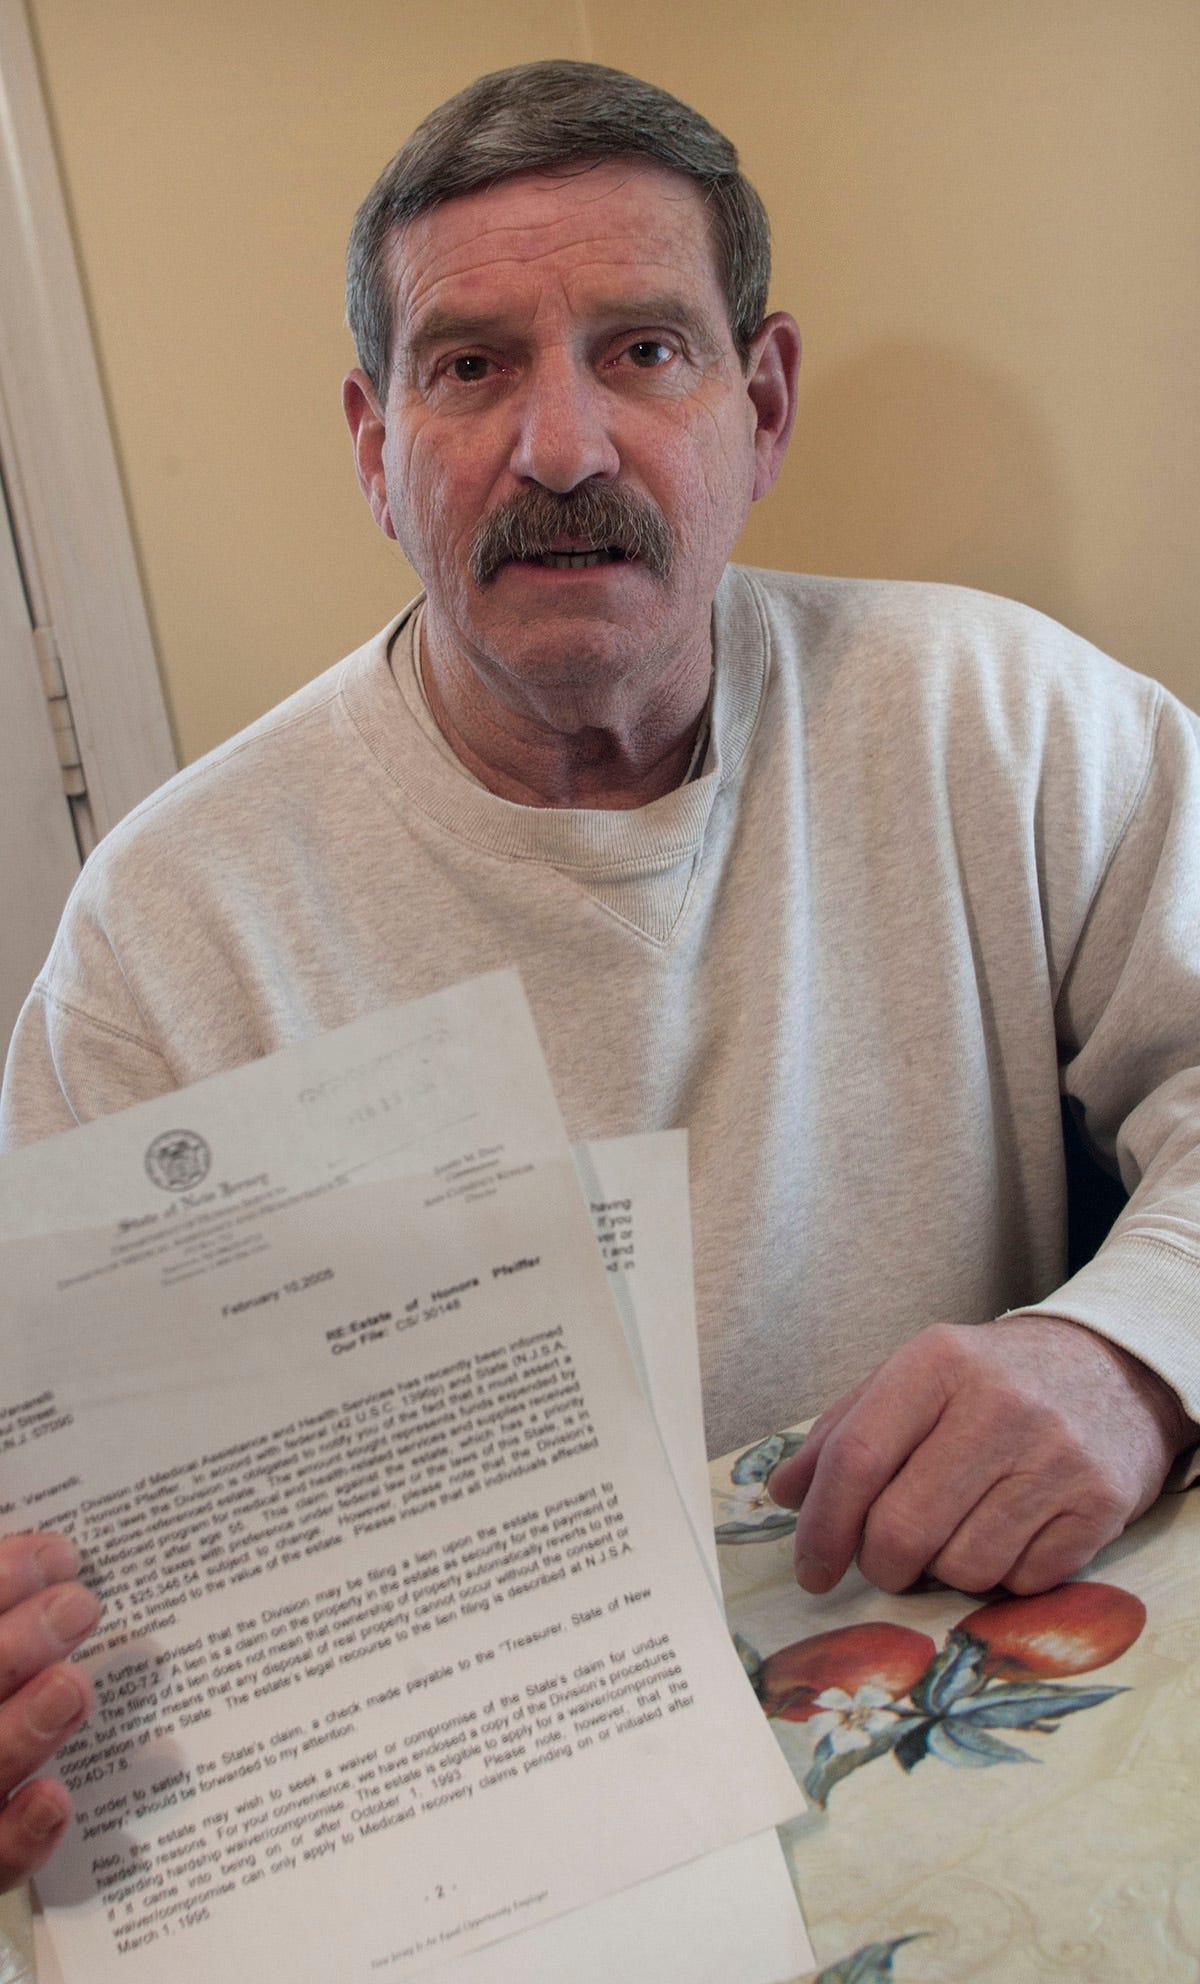 Liquidating assets before entering a nursing home